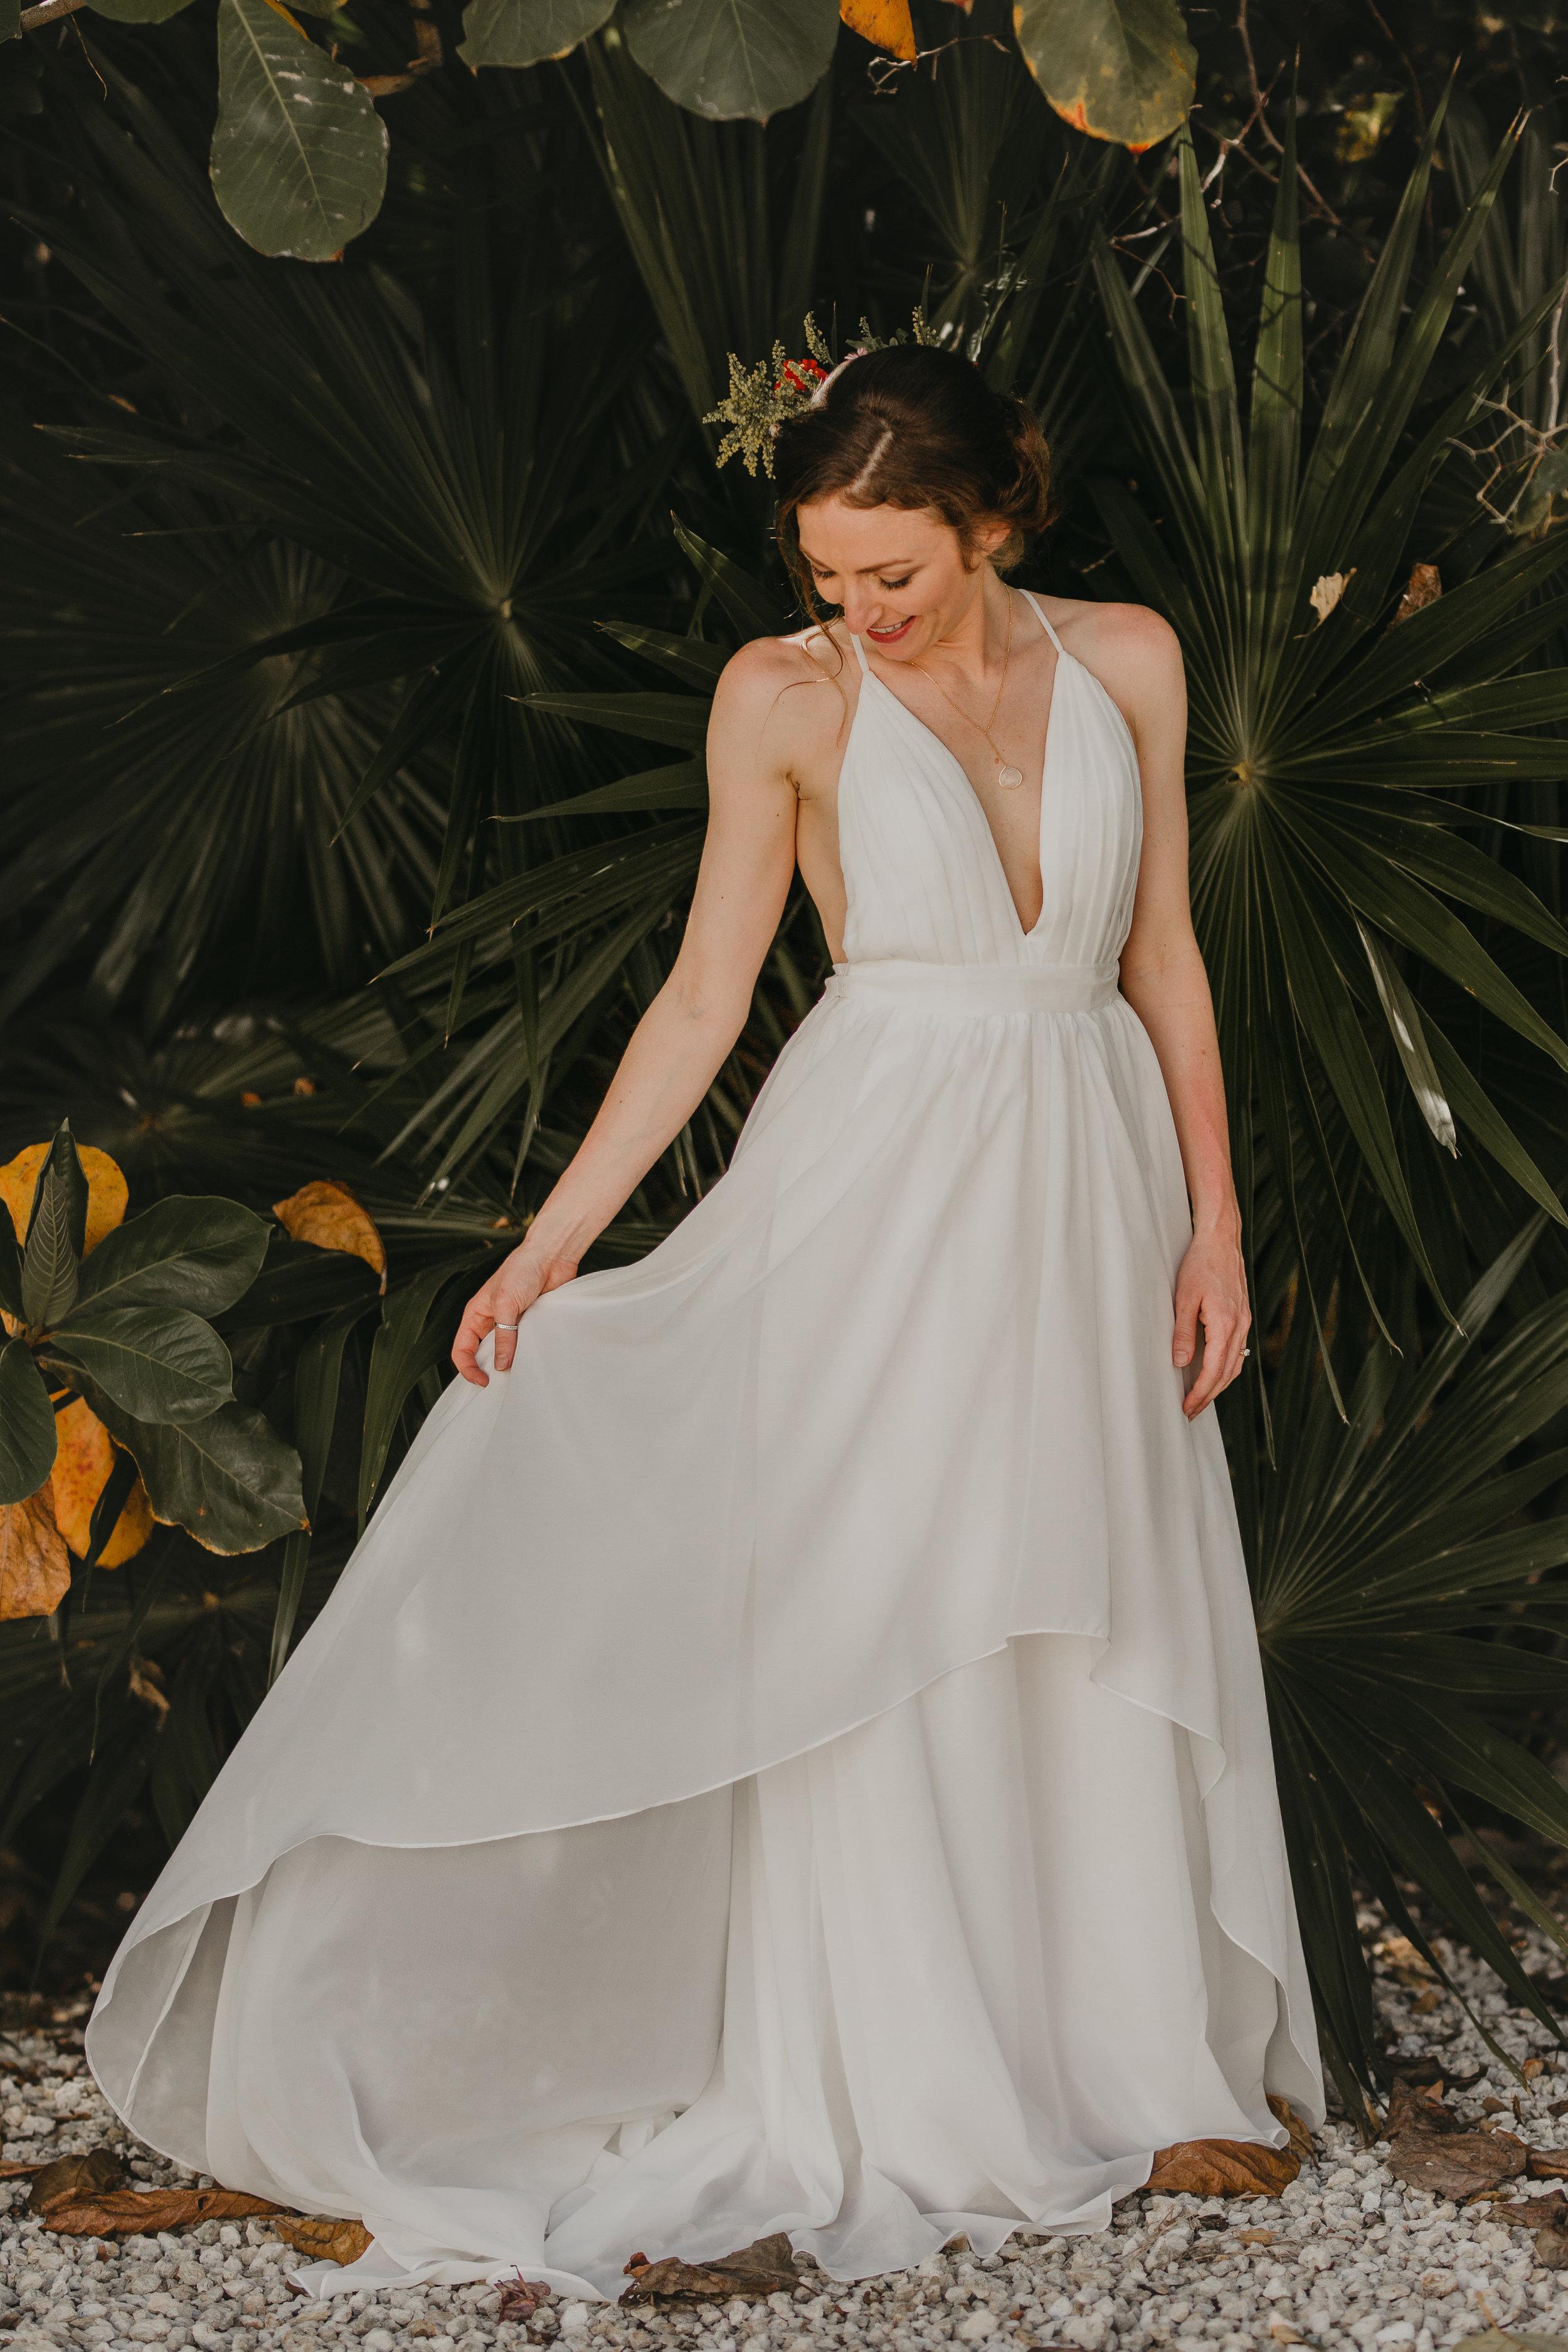 Nicole-Daacke-Photography-beachfront-akumal-destionation-wedding-tulum-mexico-elopement-photographer-destination-wedding-inspiration-sunset-champagne-pop-boho-bride-ocean-tropical-bohemian-tulum-wedding-photos-117.jpg